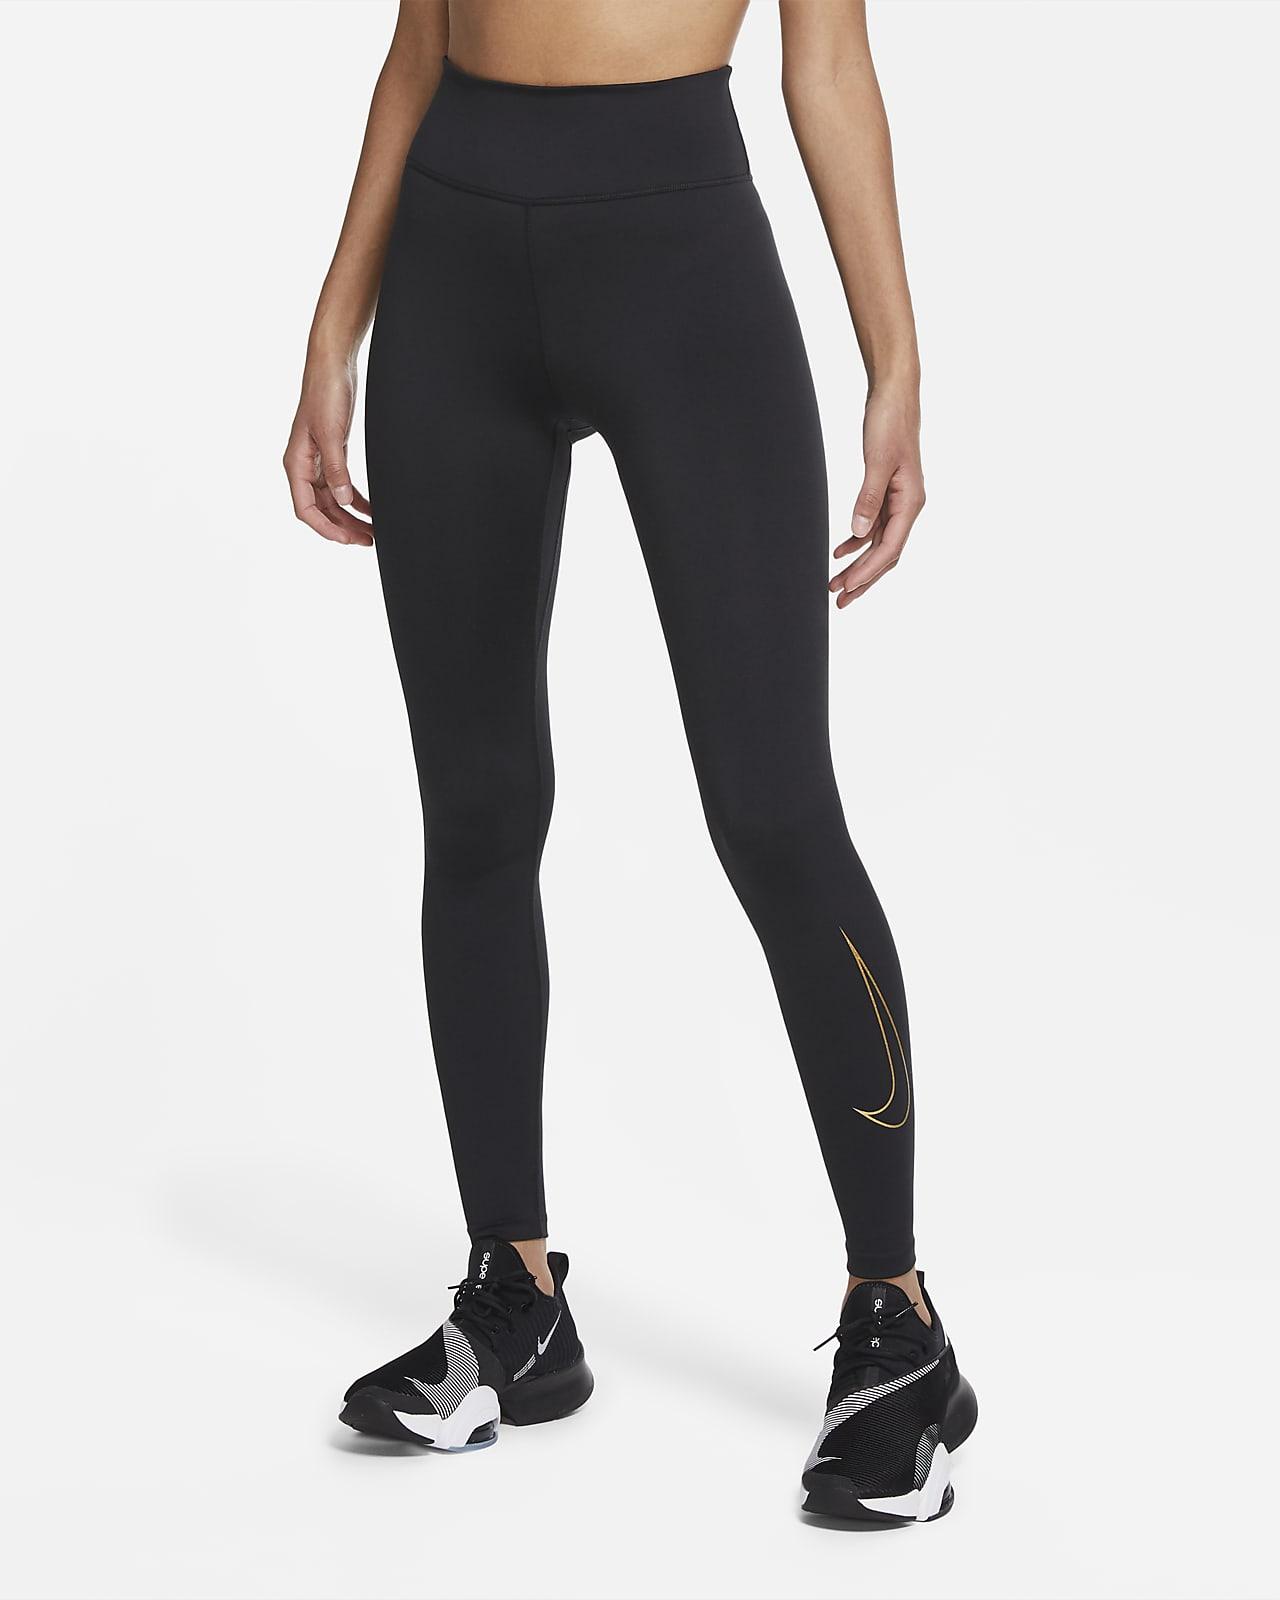 Nike One Icon Clash Malles - Dona